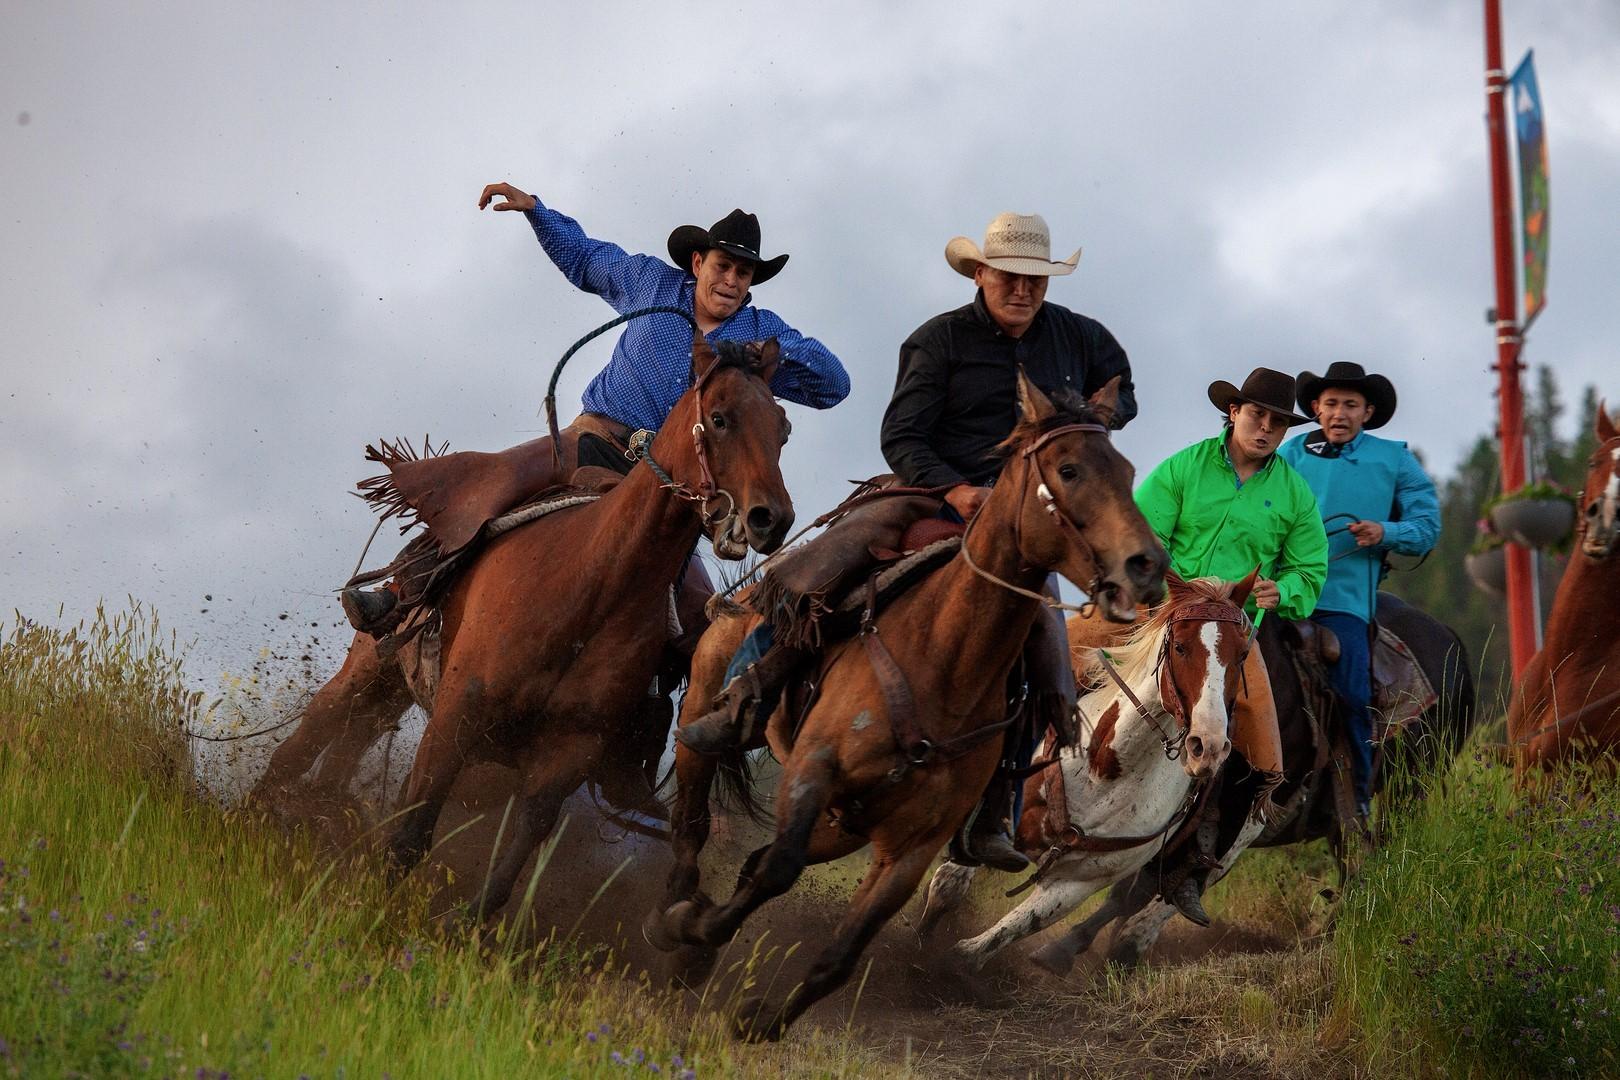 Racing horses natif